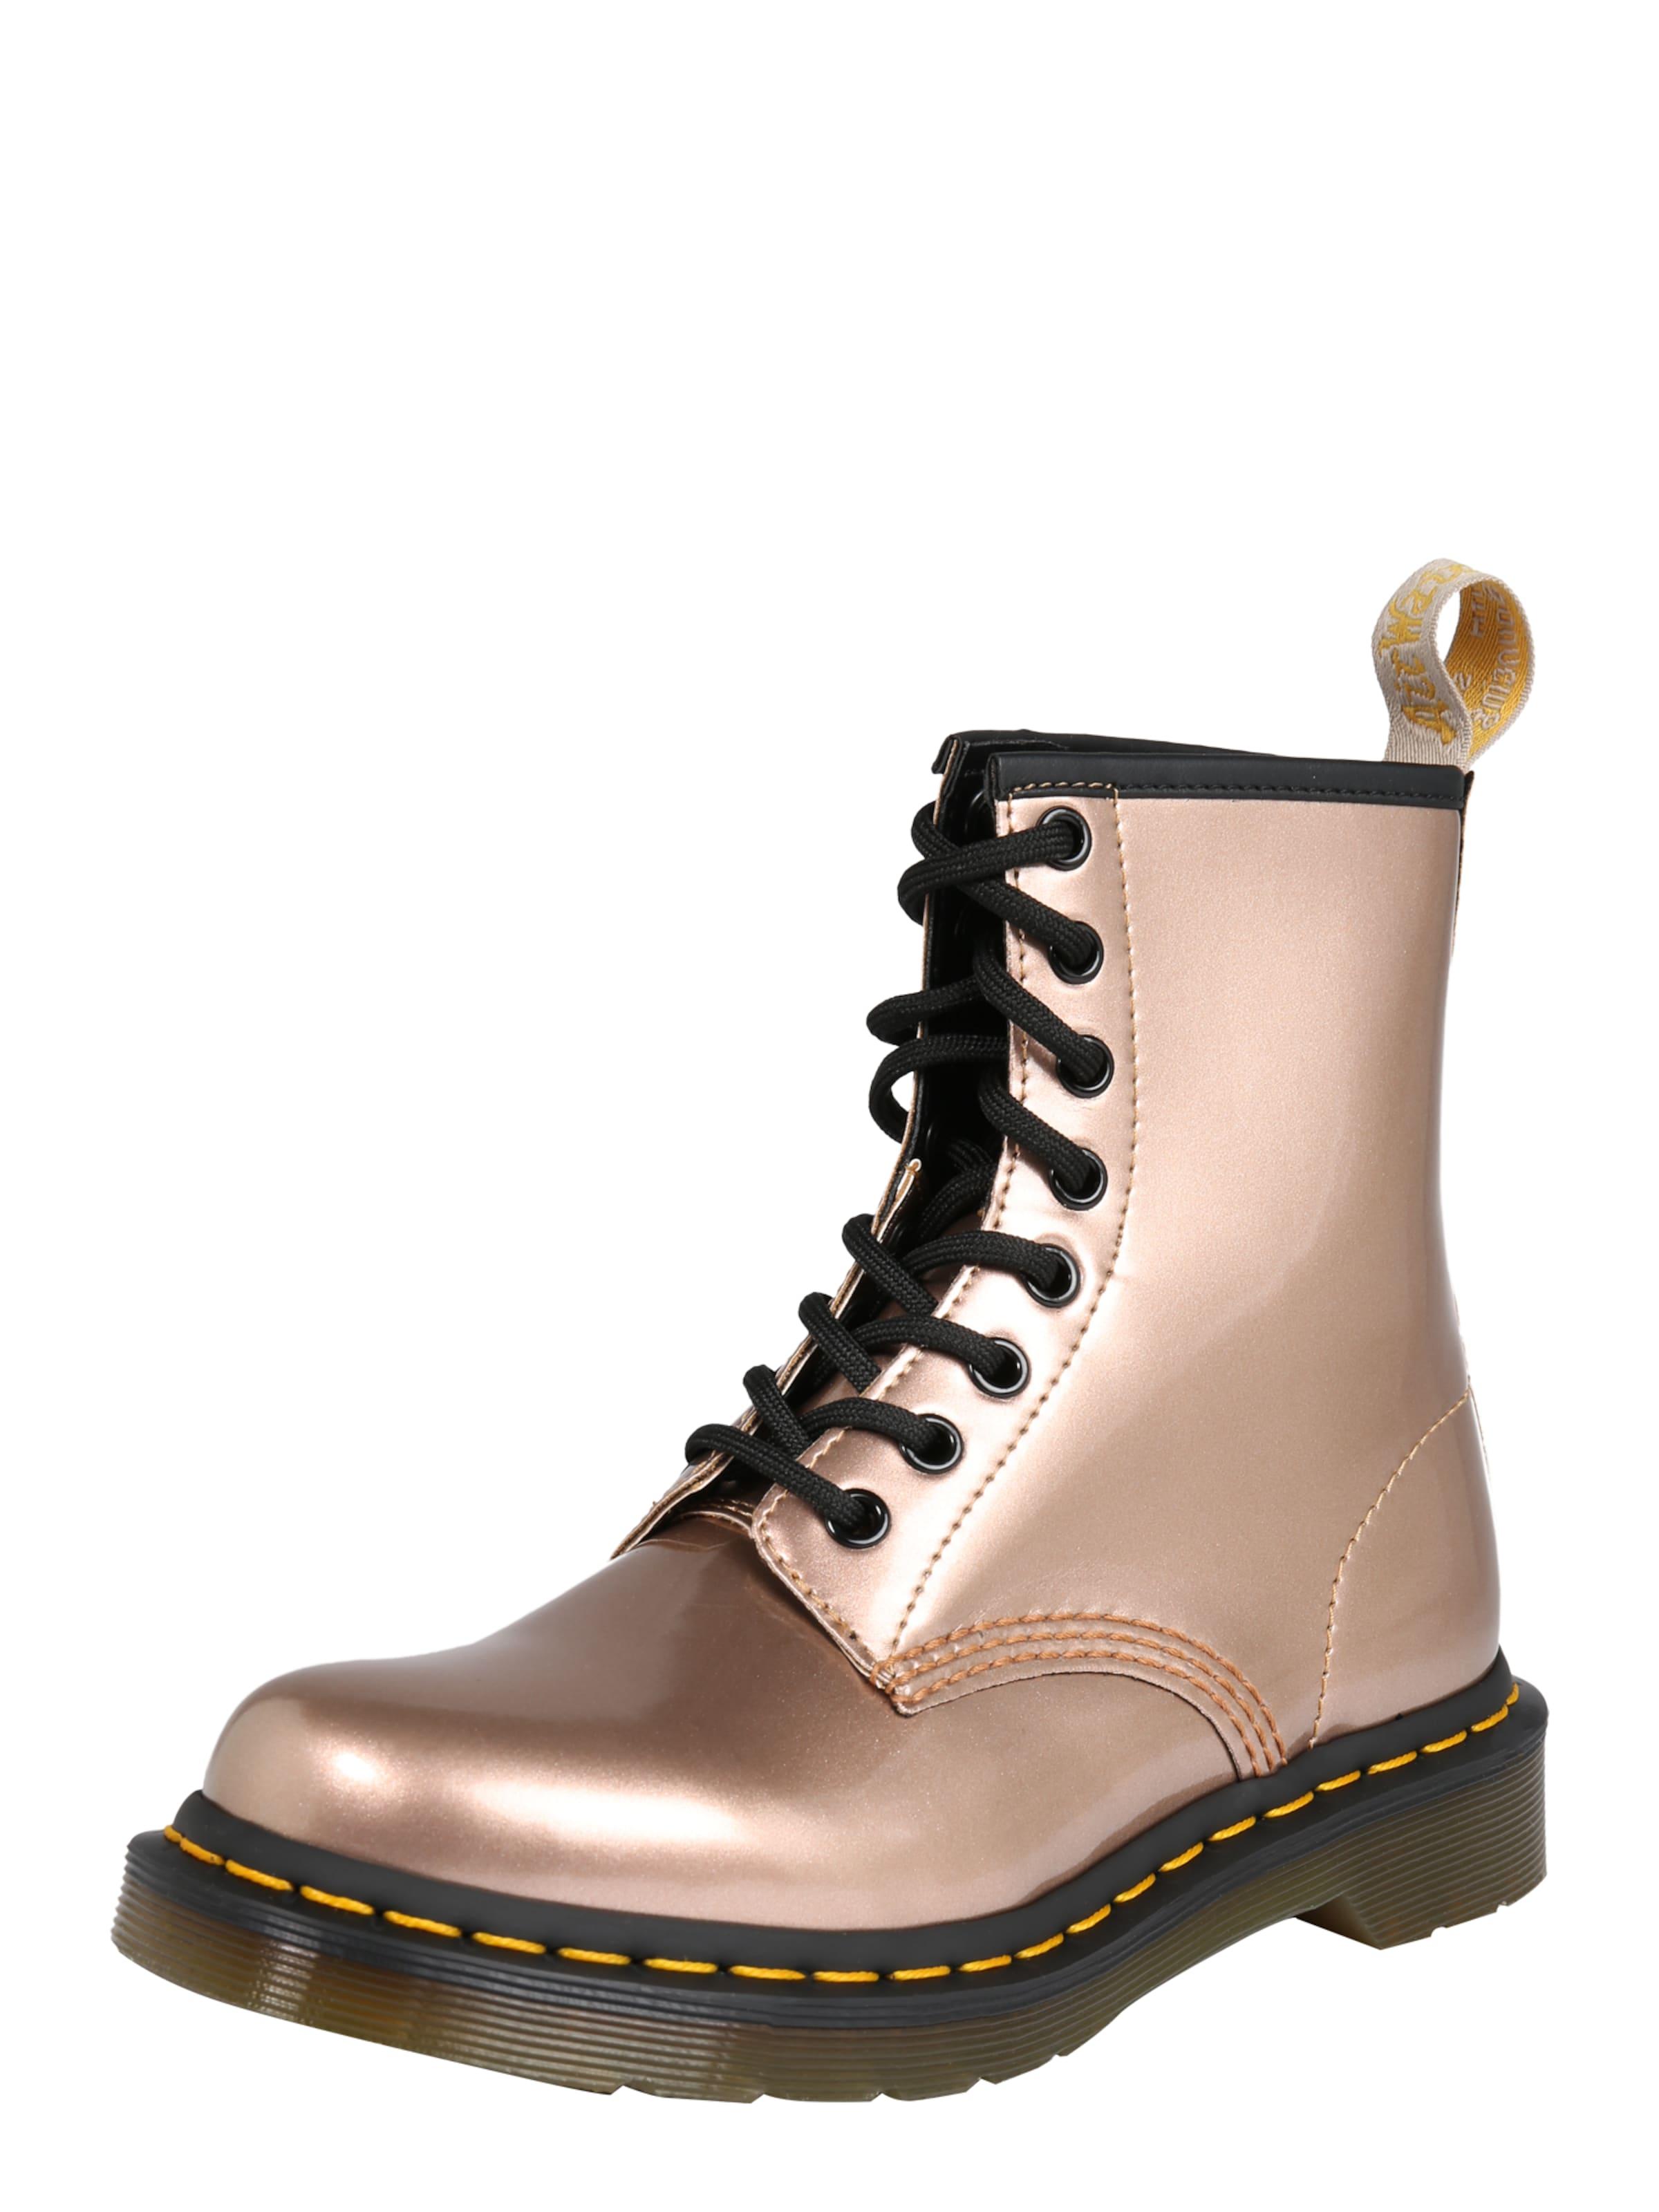 Eye DrMartens Stiefel Boot 1460 Rosé '8 In Vegan' OiTkZXuP